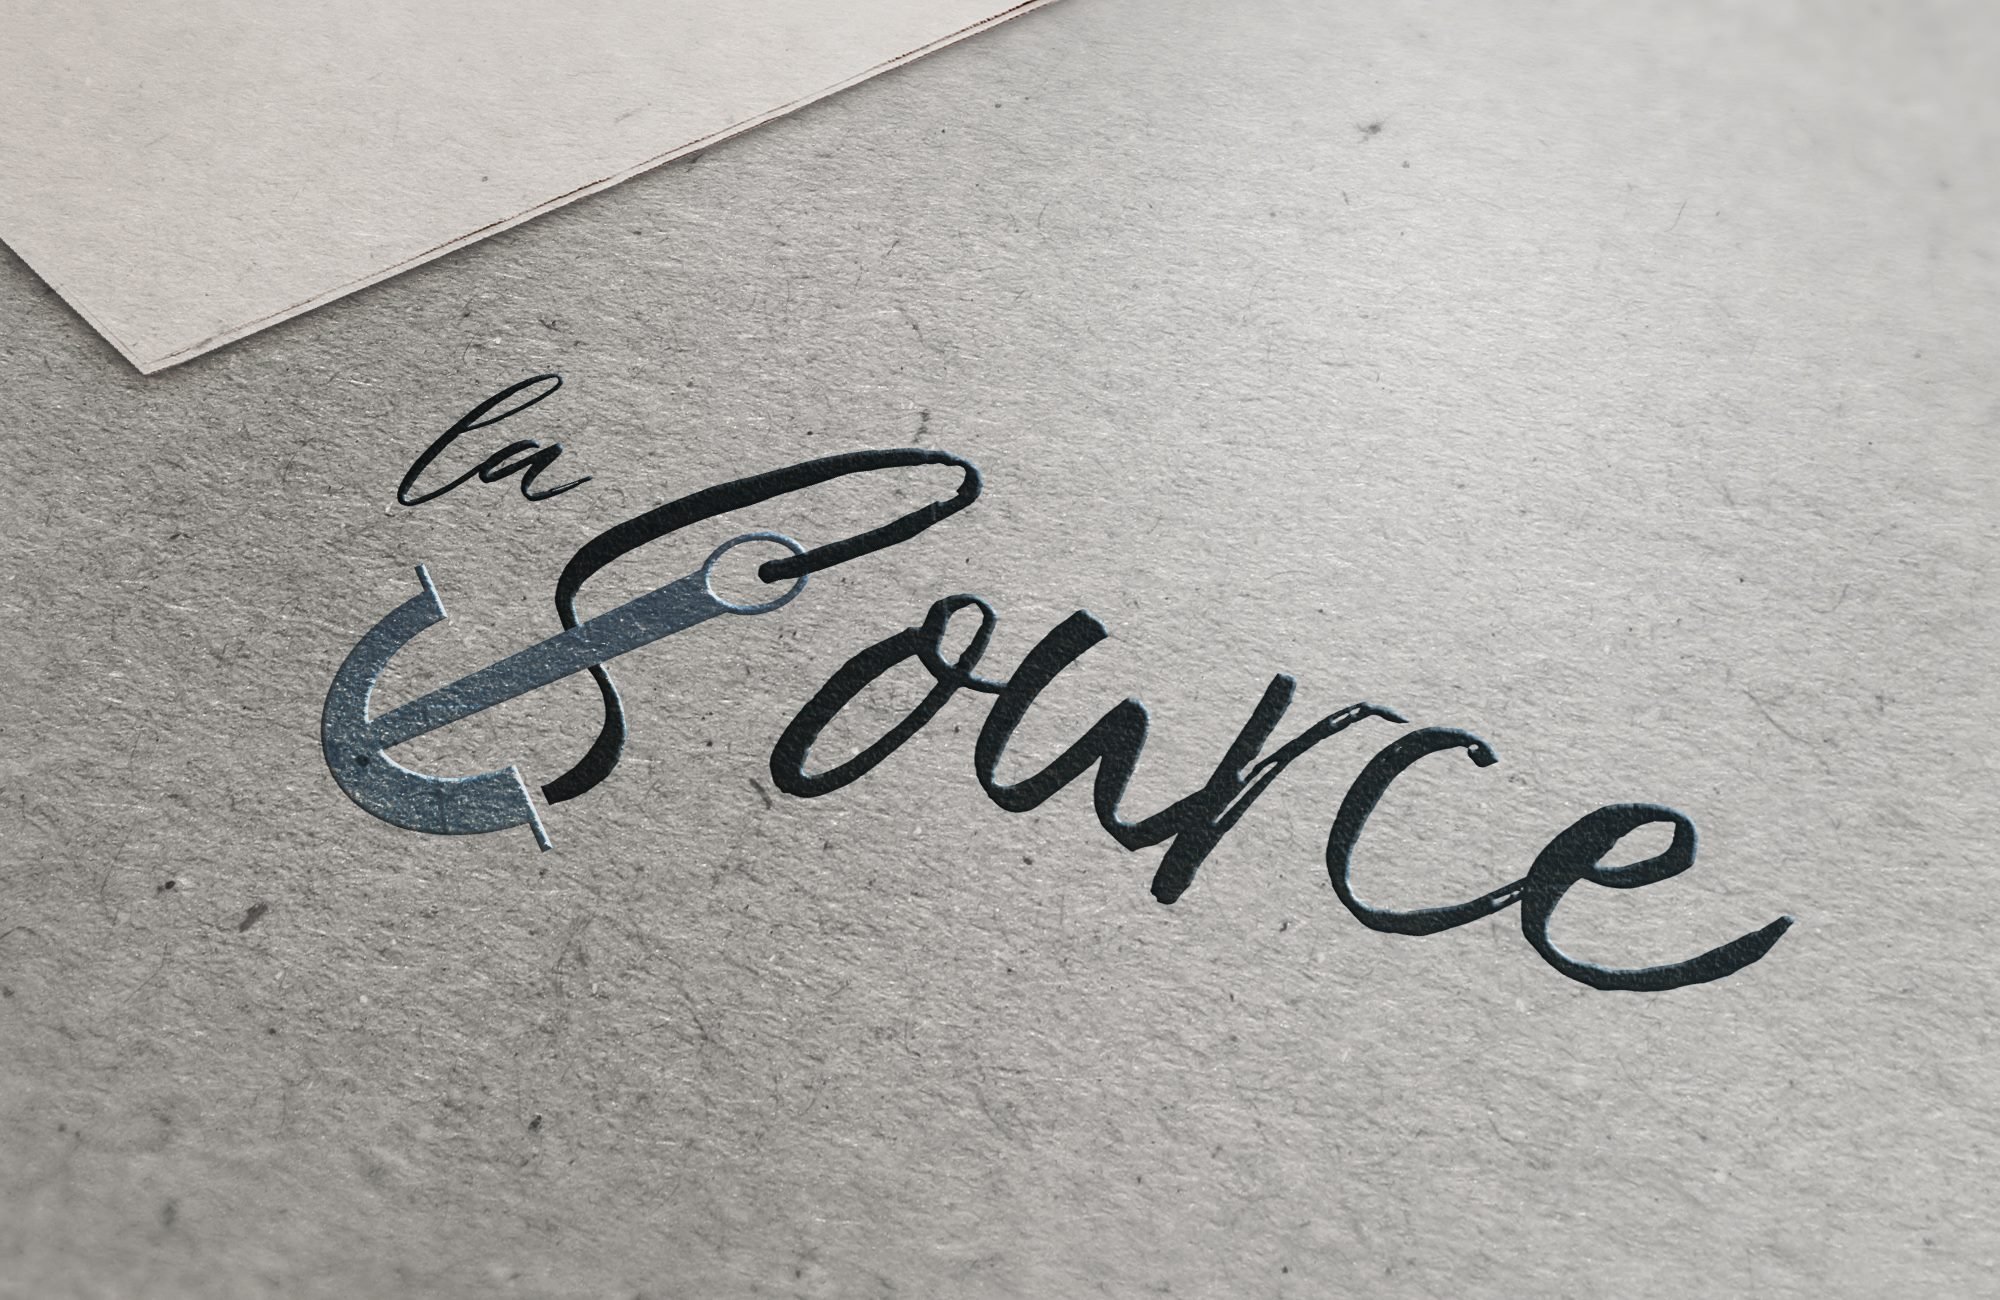 logotype_lasource_restaurant_bar_laboite_agencemarketing_beauce_quebec.jpg